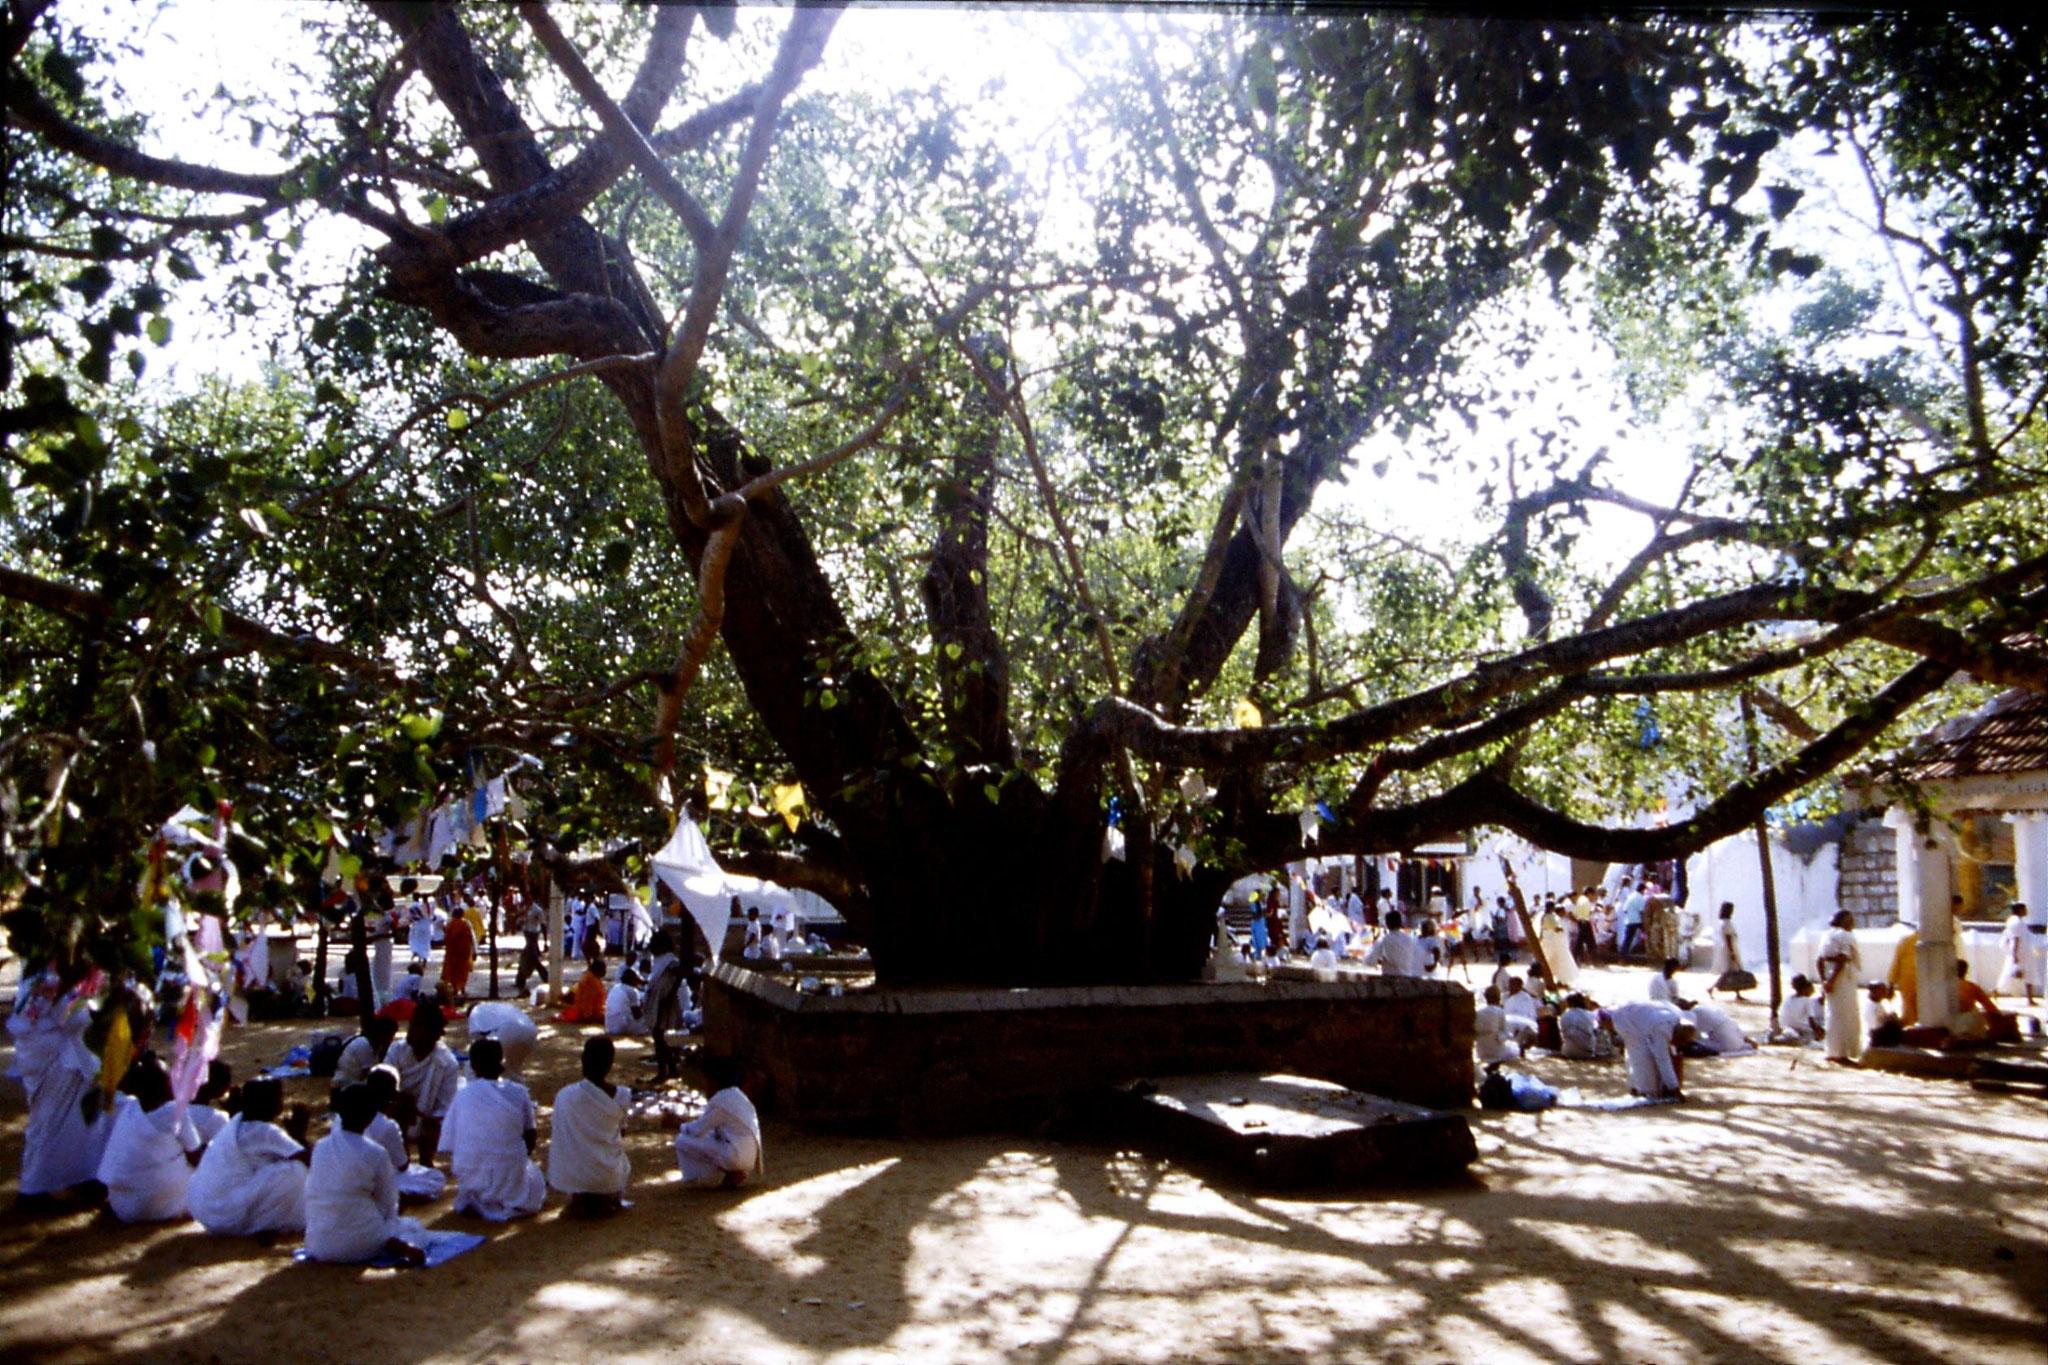 9/2/1990: 5: Anuradhapura, pilgrims under Bo tree